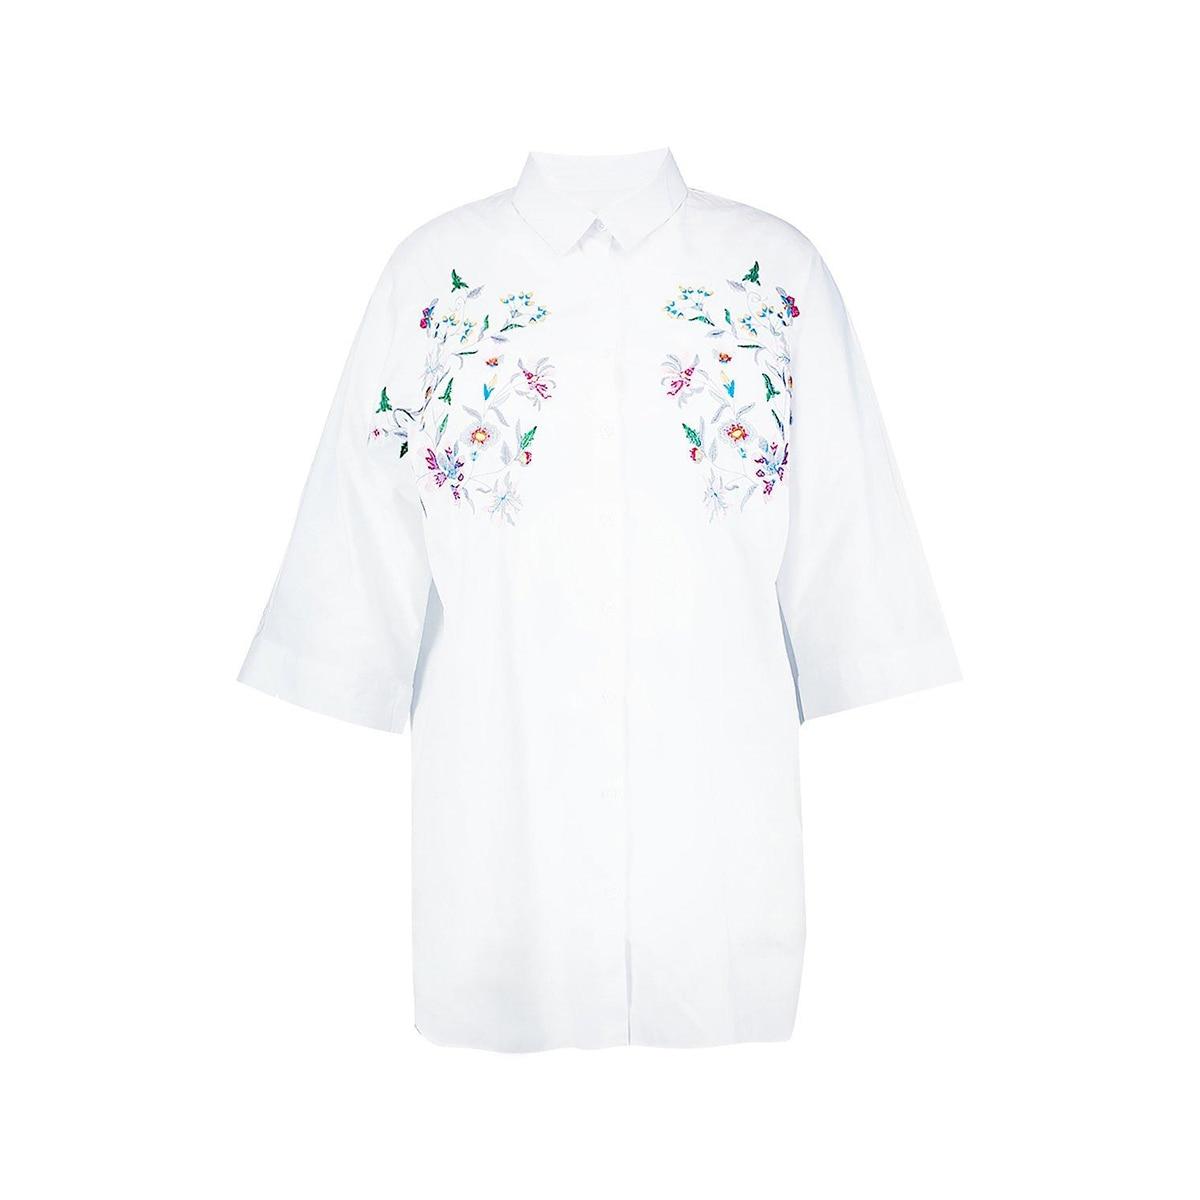 Kissmilk Women Plus Size Foral Embroidery Turn Down Collar Shirt Nine Quarter Sleeve Solid Basic Shirt Large Size Casual Shirt 4